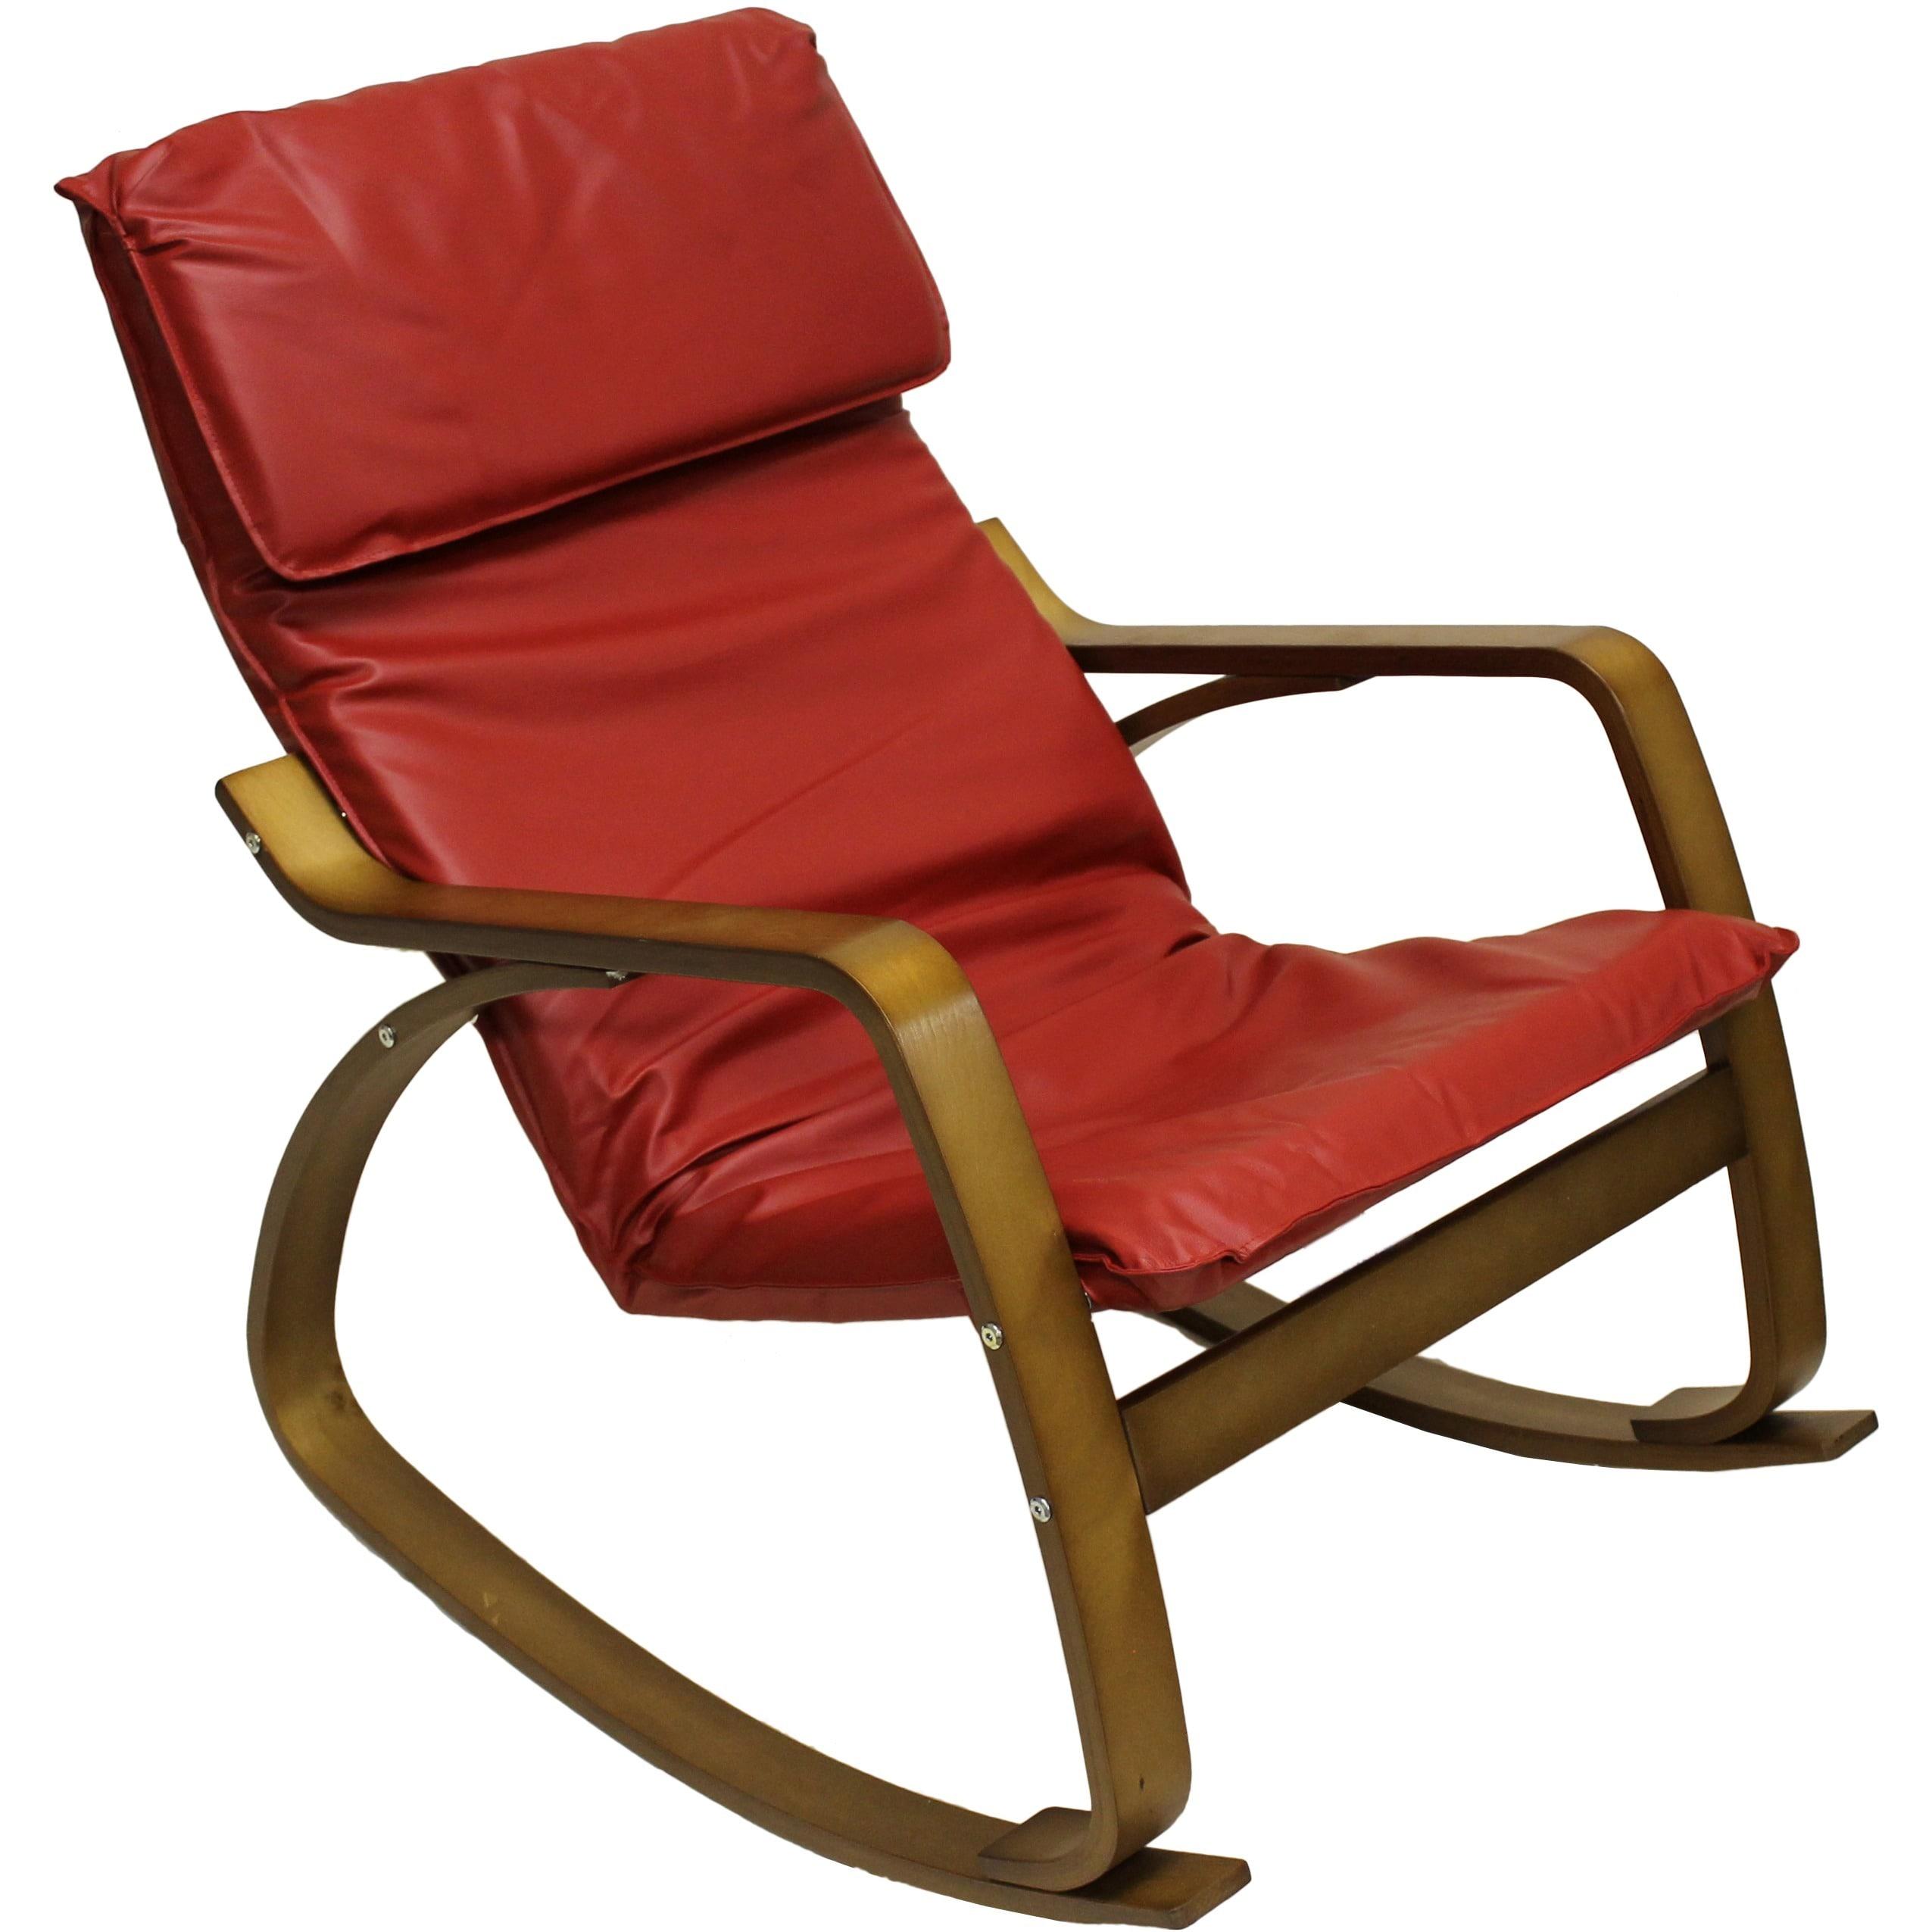 International Caravan Stockholm Bentwood Faux Leather Rocking Chair